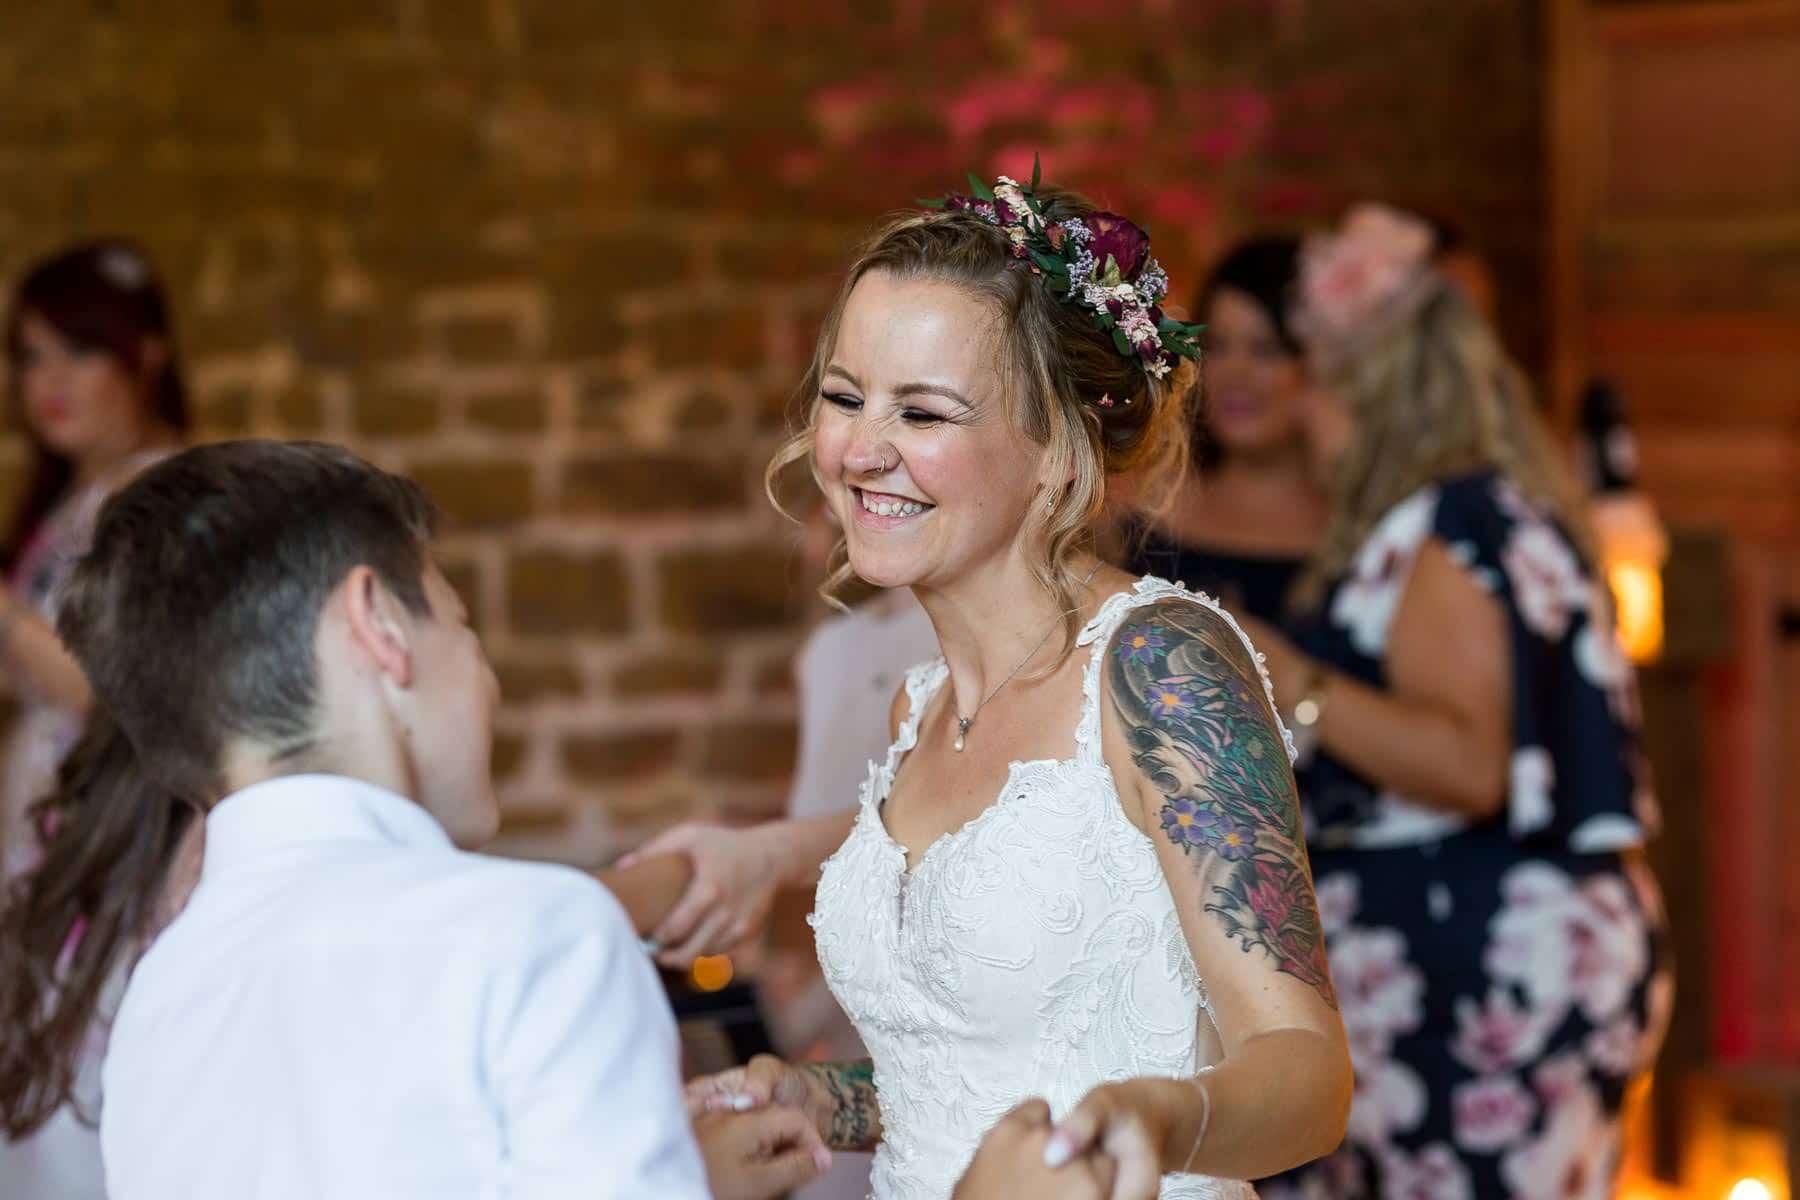 Bride smiling on the dance floor